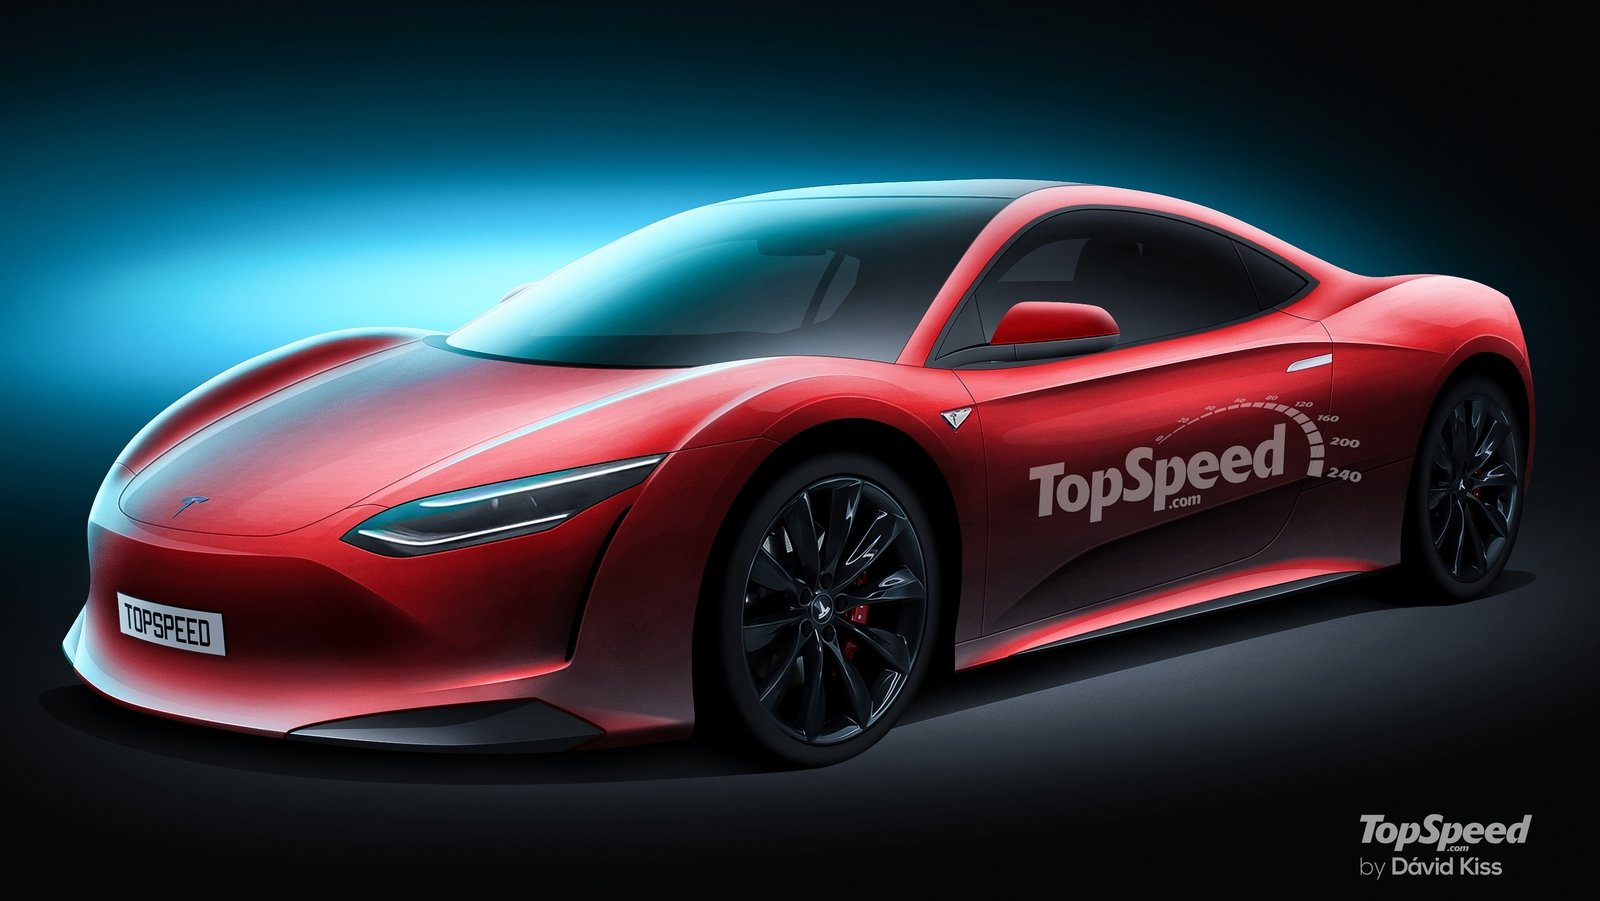 2020 Tesla Supercar